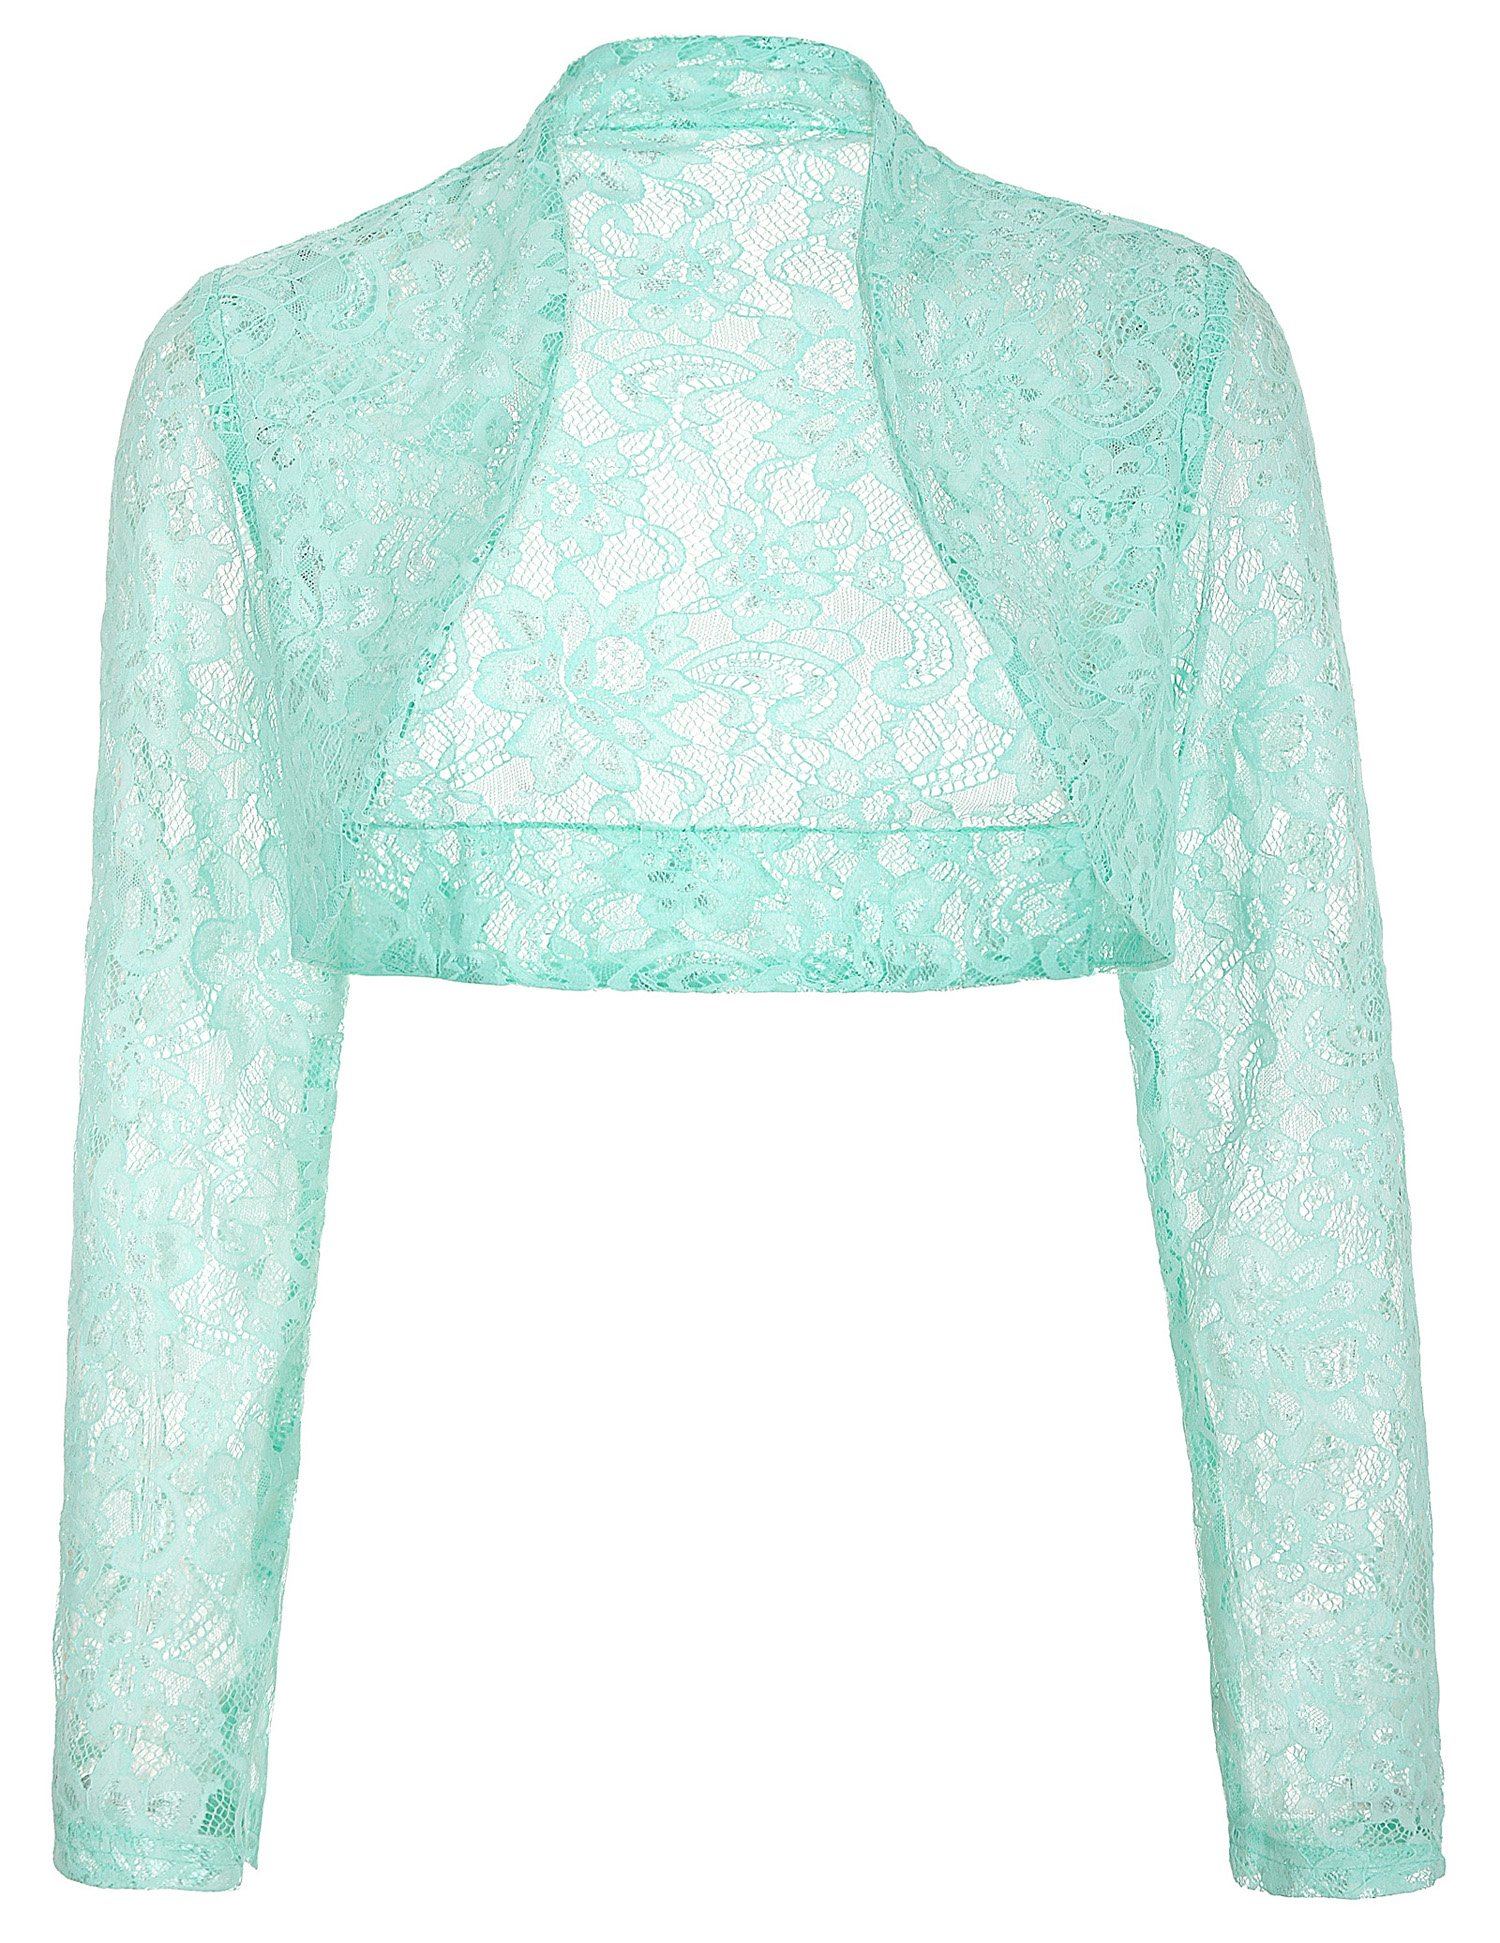 Fashion Floral Lace Crochet Bolero Shrug Cardigan Crop Top JS49-3 XL